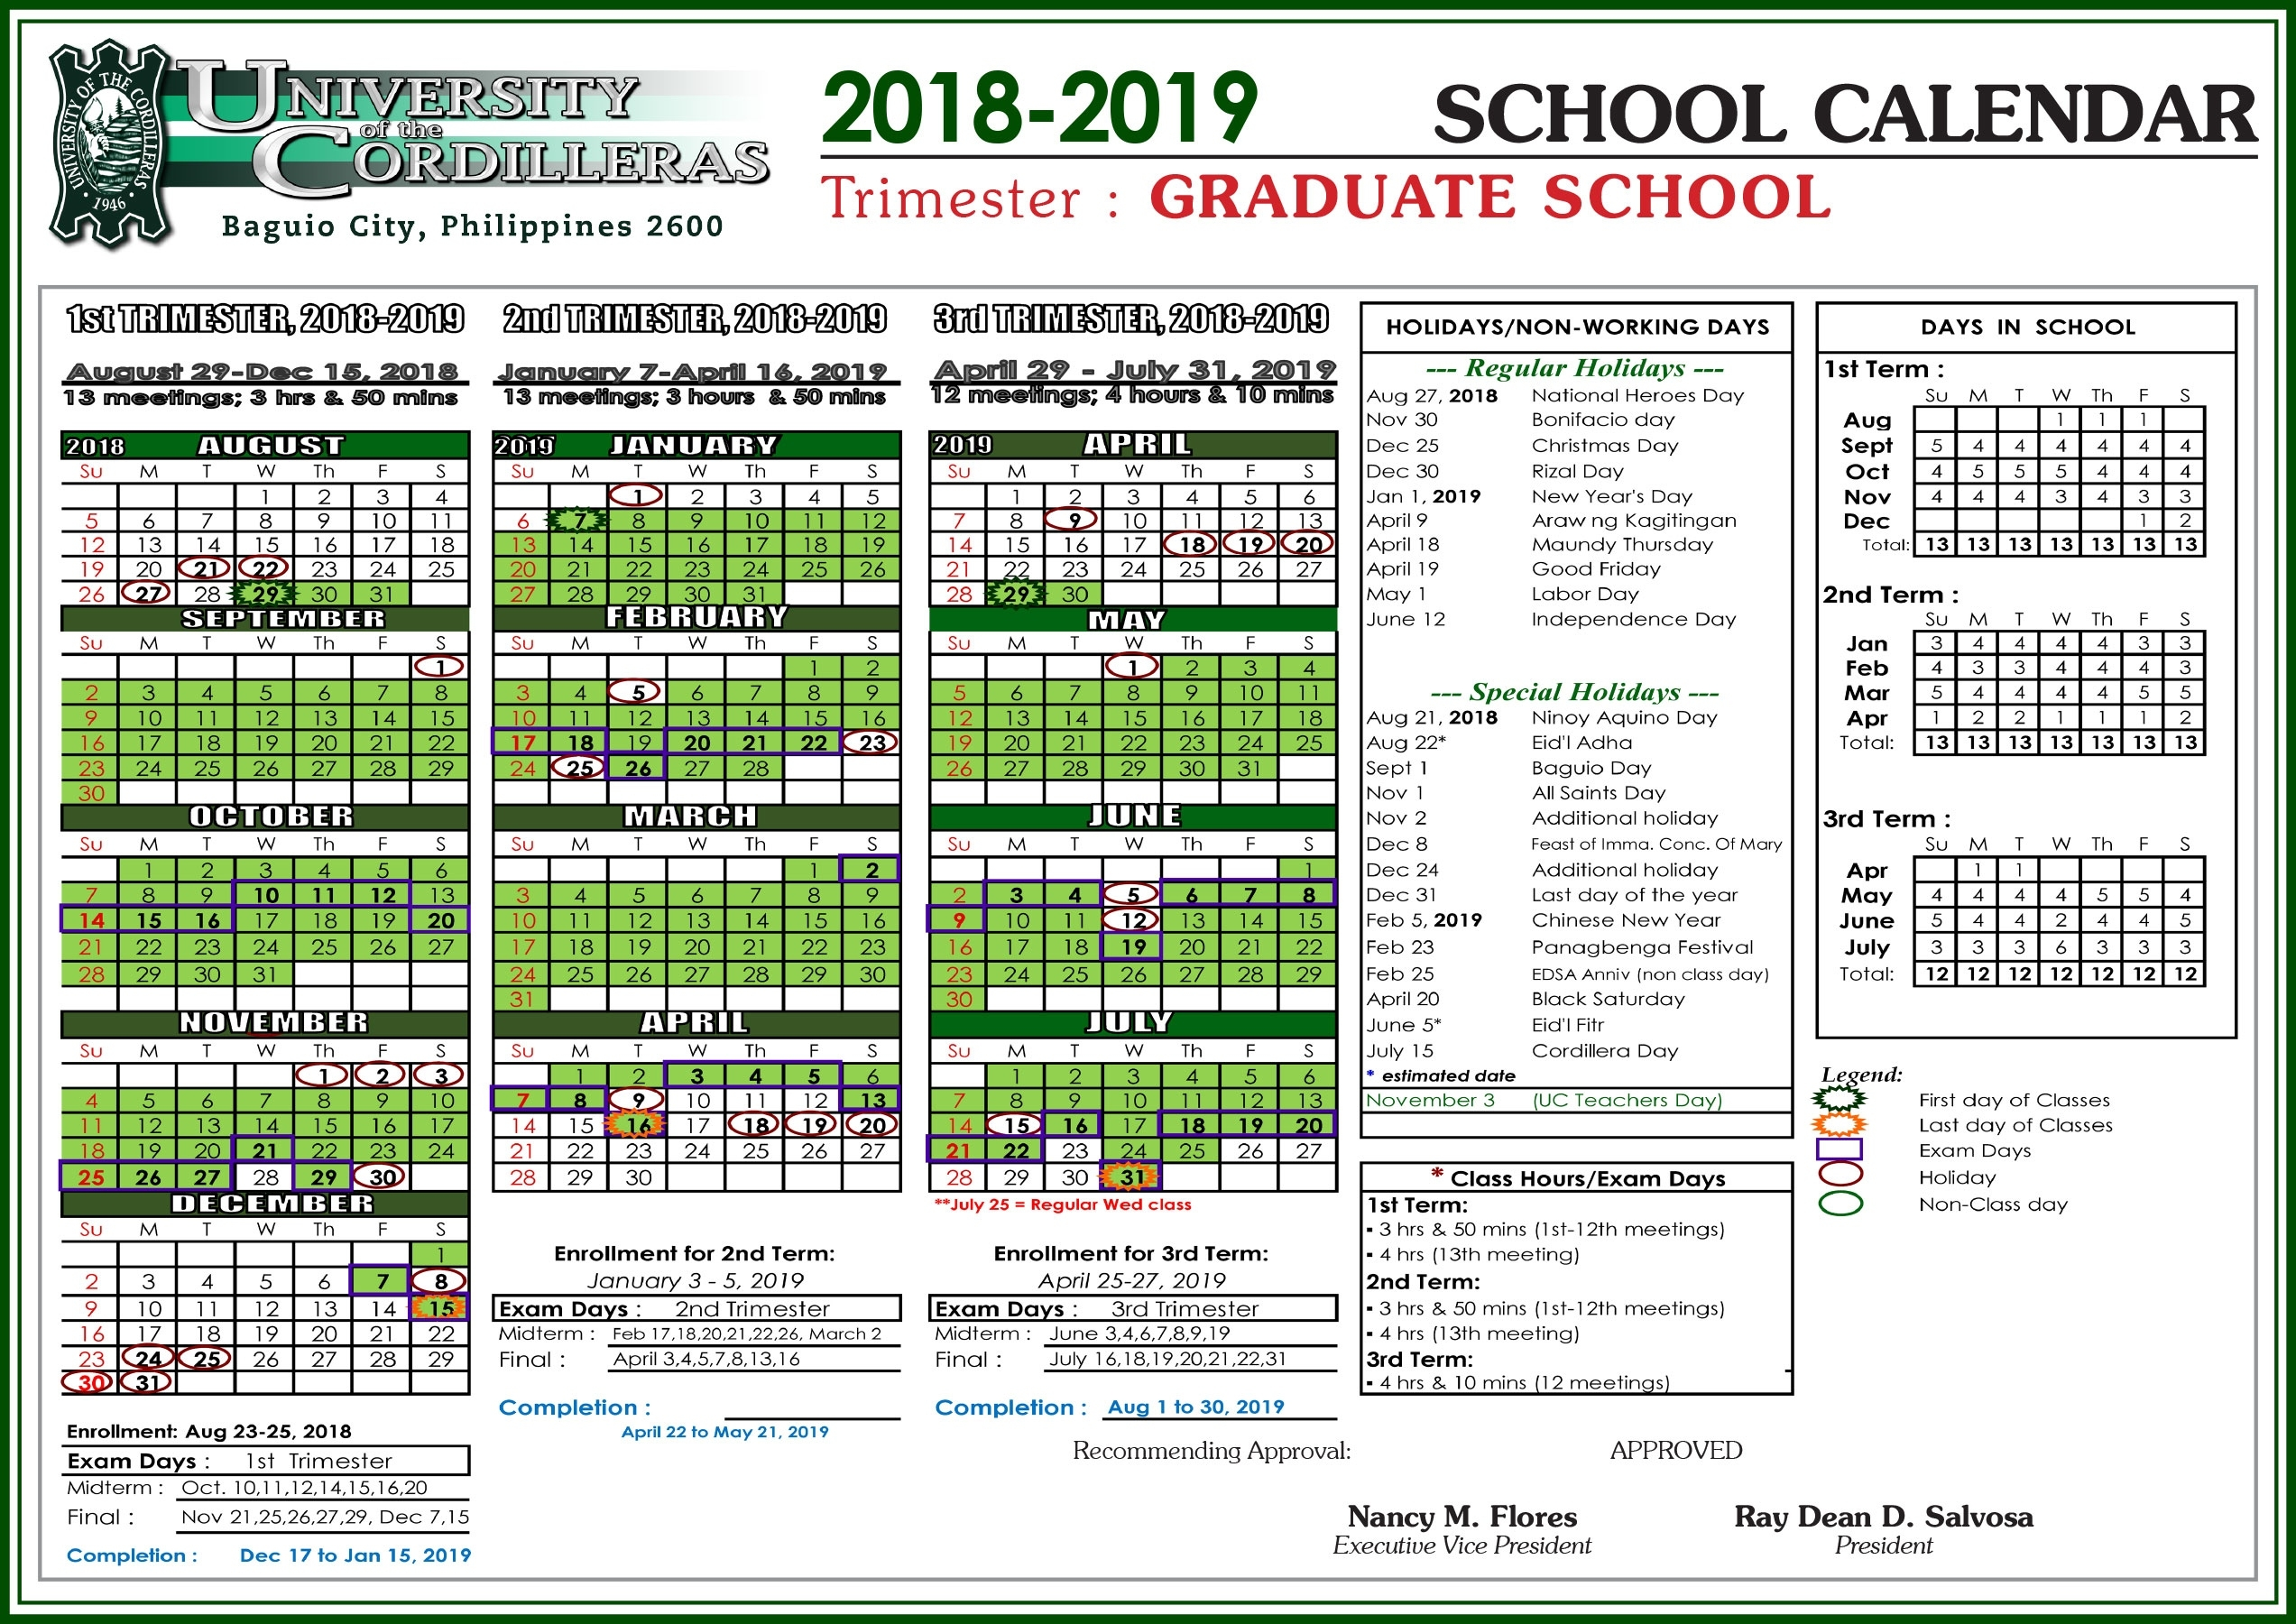 Uc School Calendar For Sy 2018-2019 - University Of The Cordilleras Tri C School Calendar